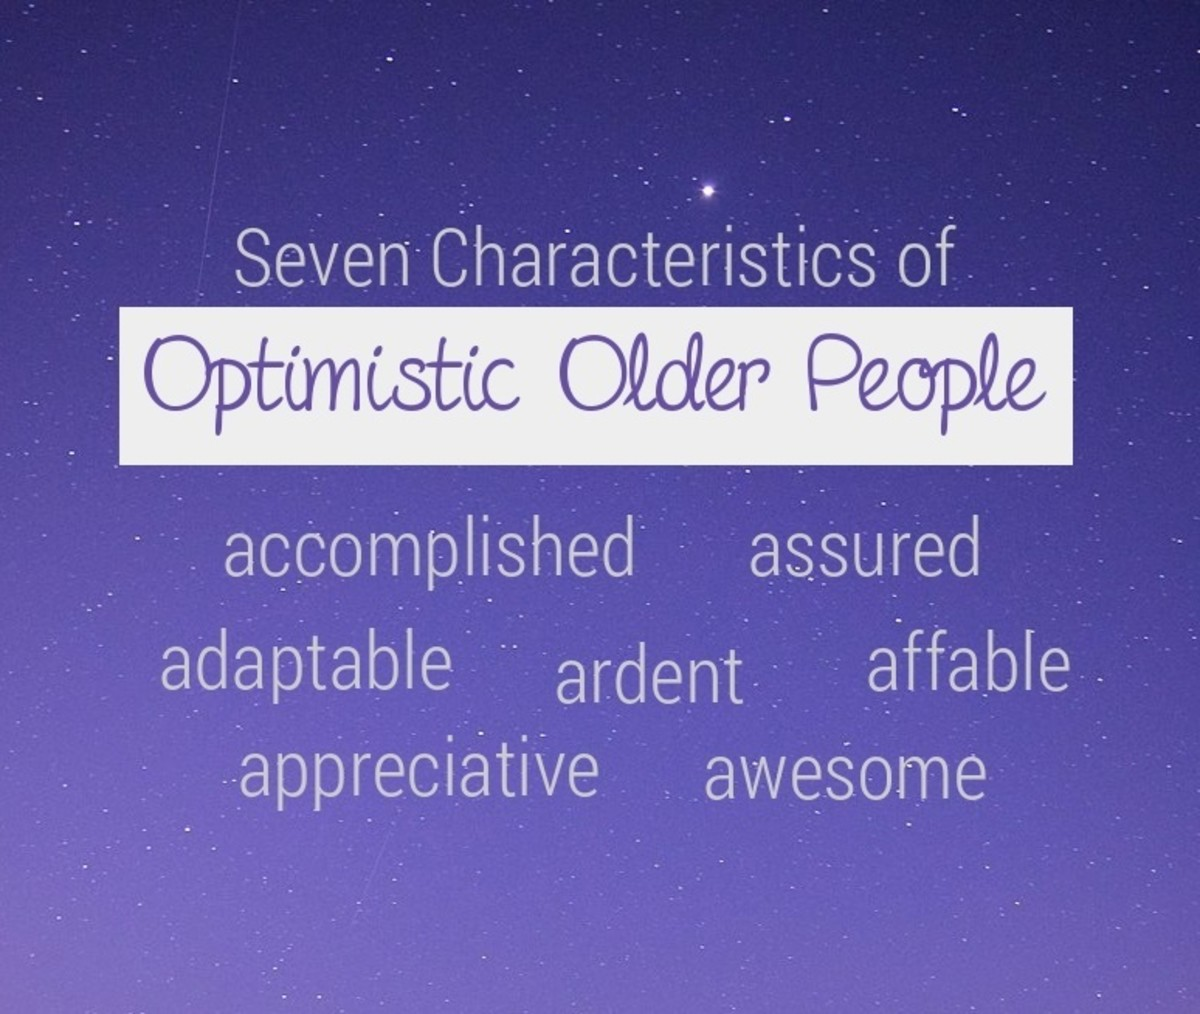 Some older folk remain healthy in mind and spirit despite their physical decline.